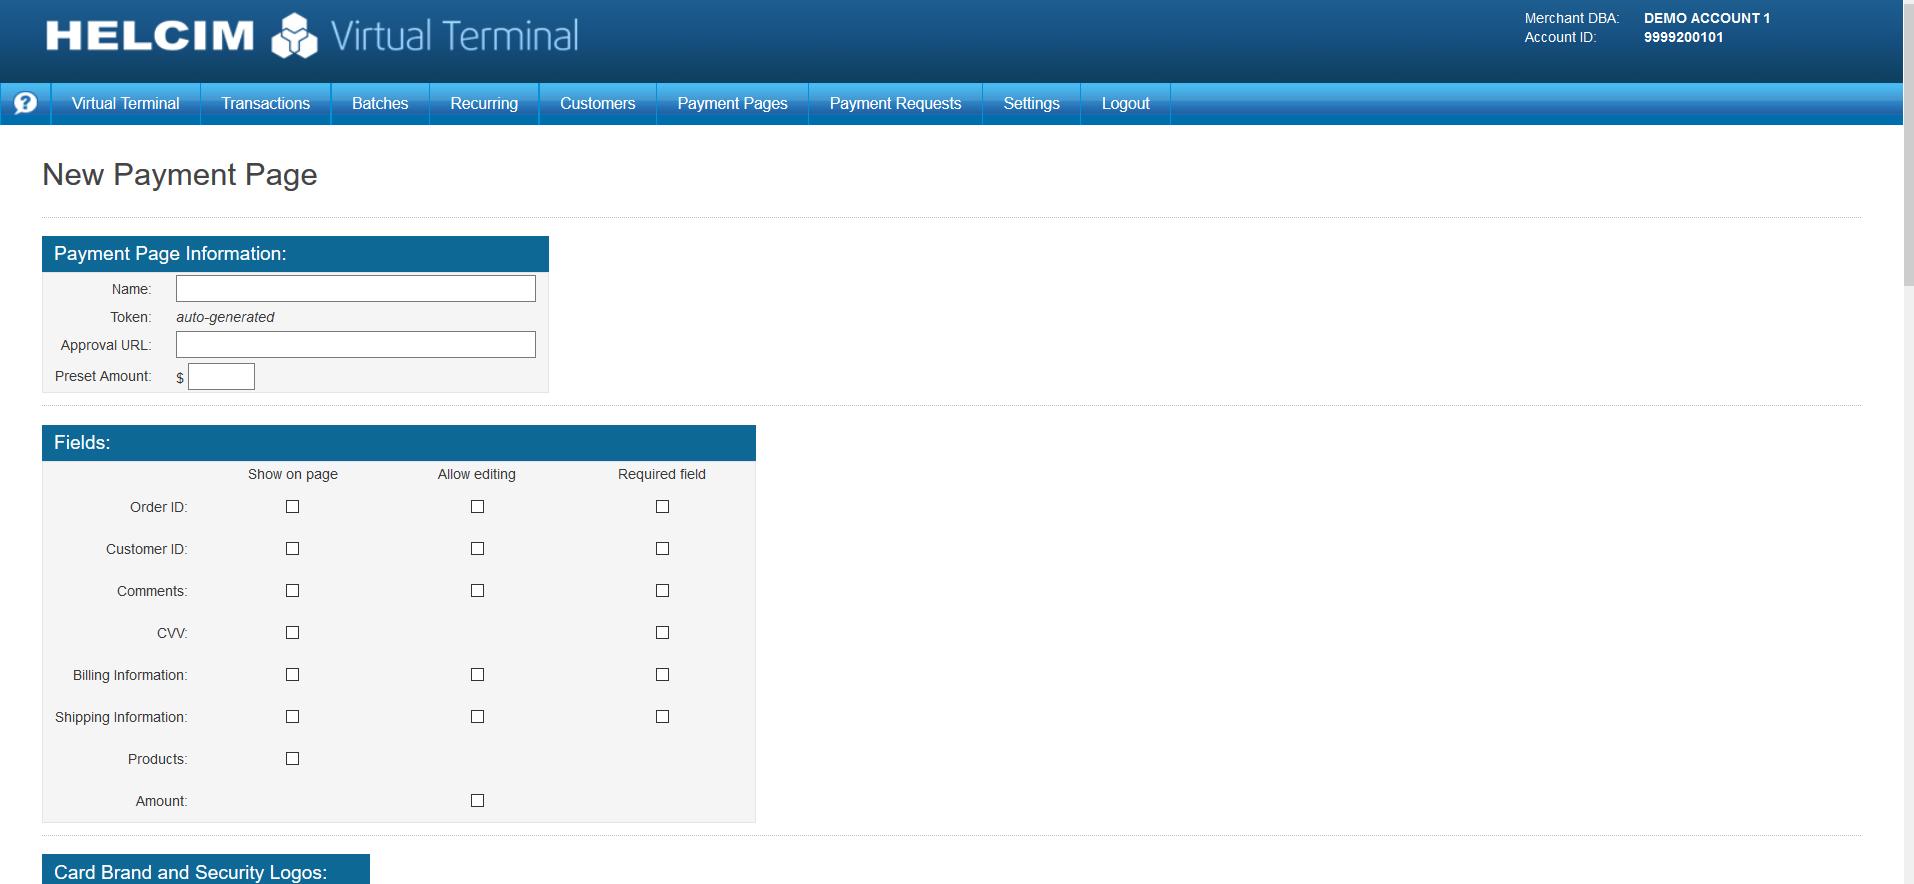 Virtual Terminal Demo - Virtual Terminal Payment Settings